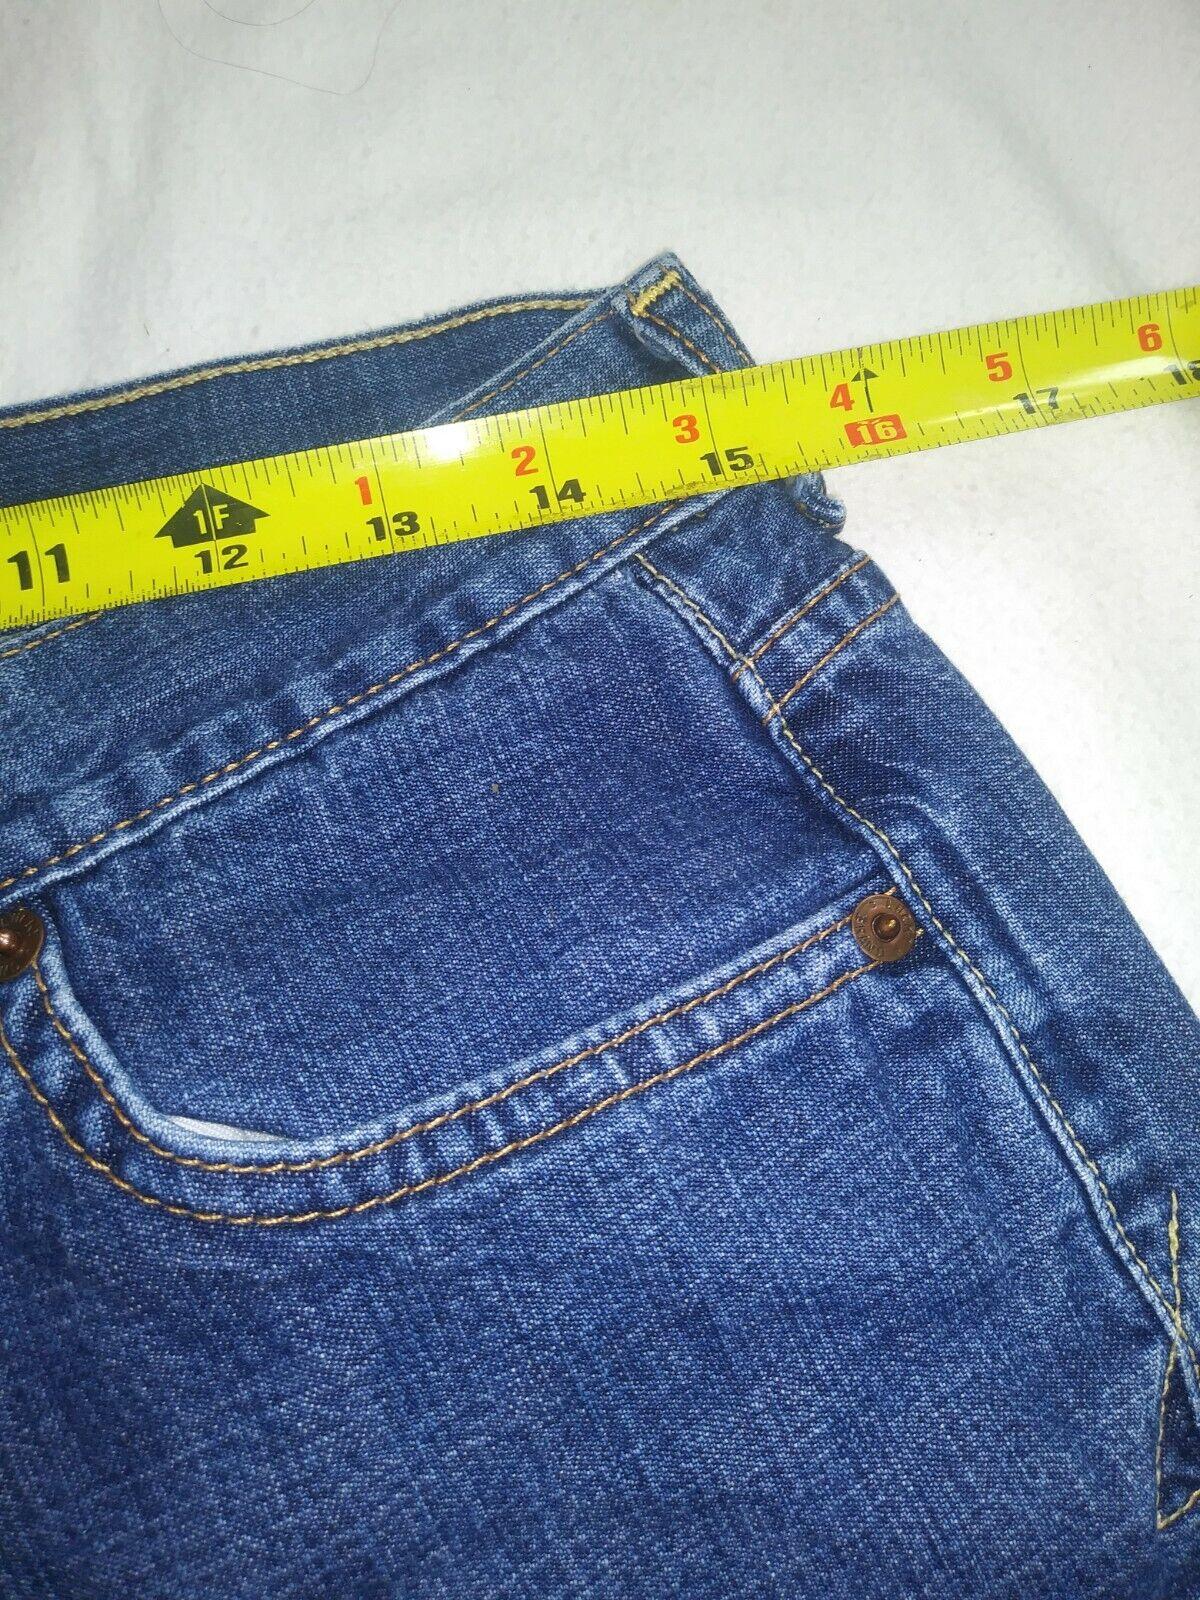 Women's Lucky Brand Dungarees Y2K Wide Leg Denim … - image 10